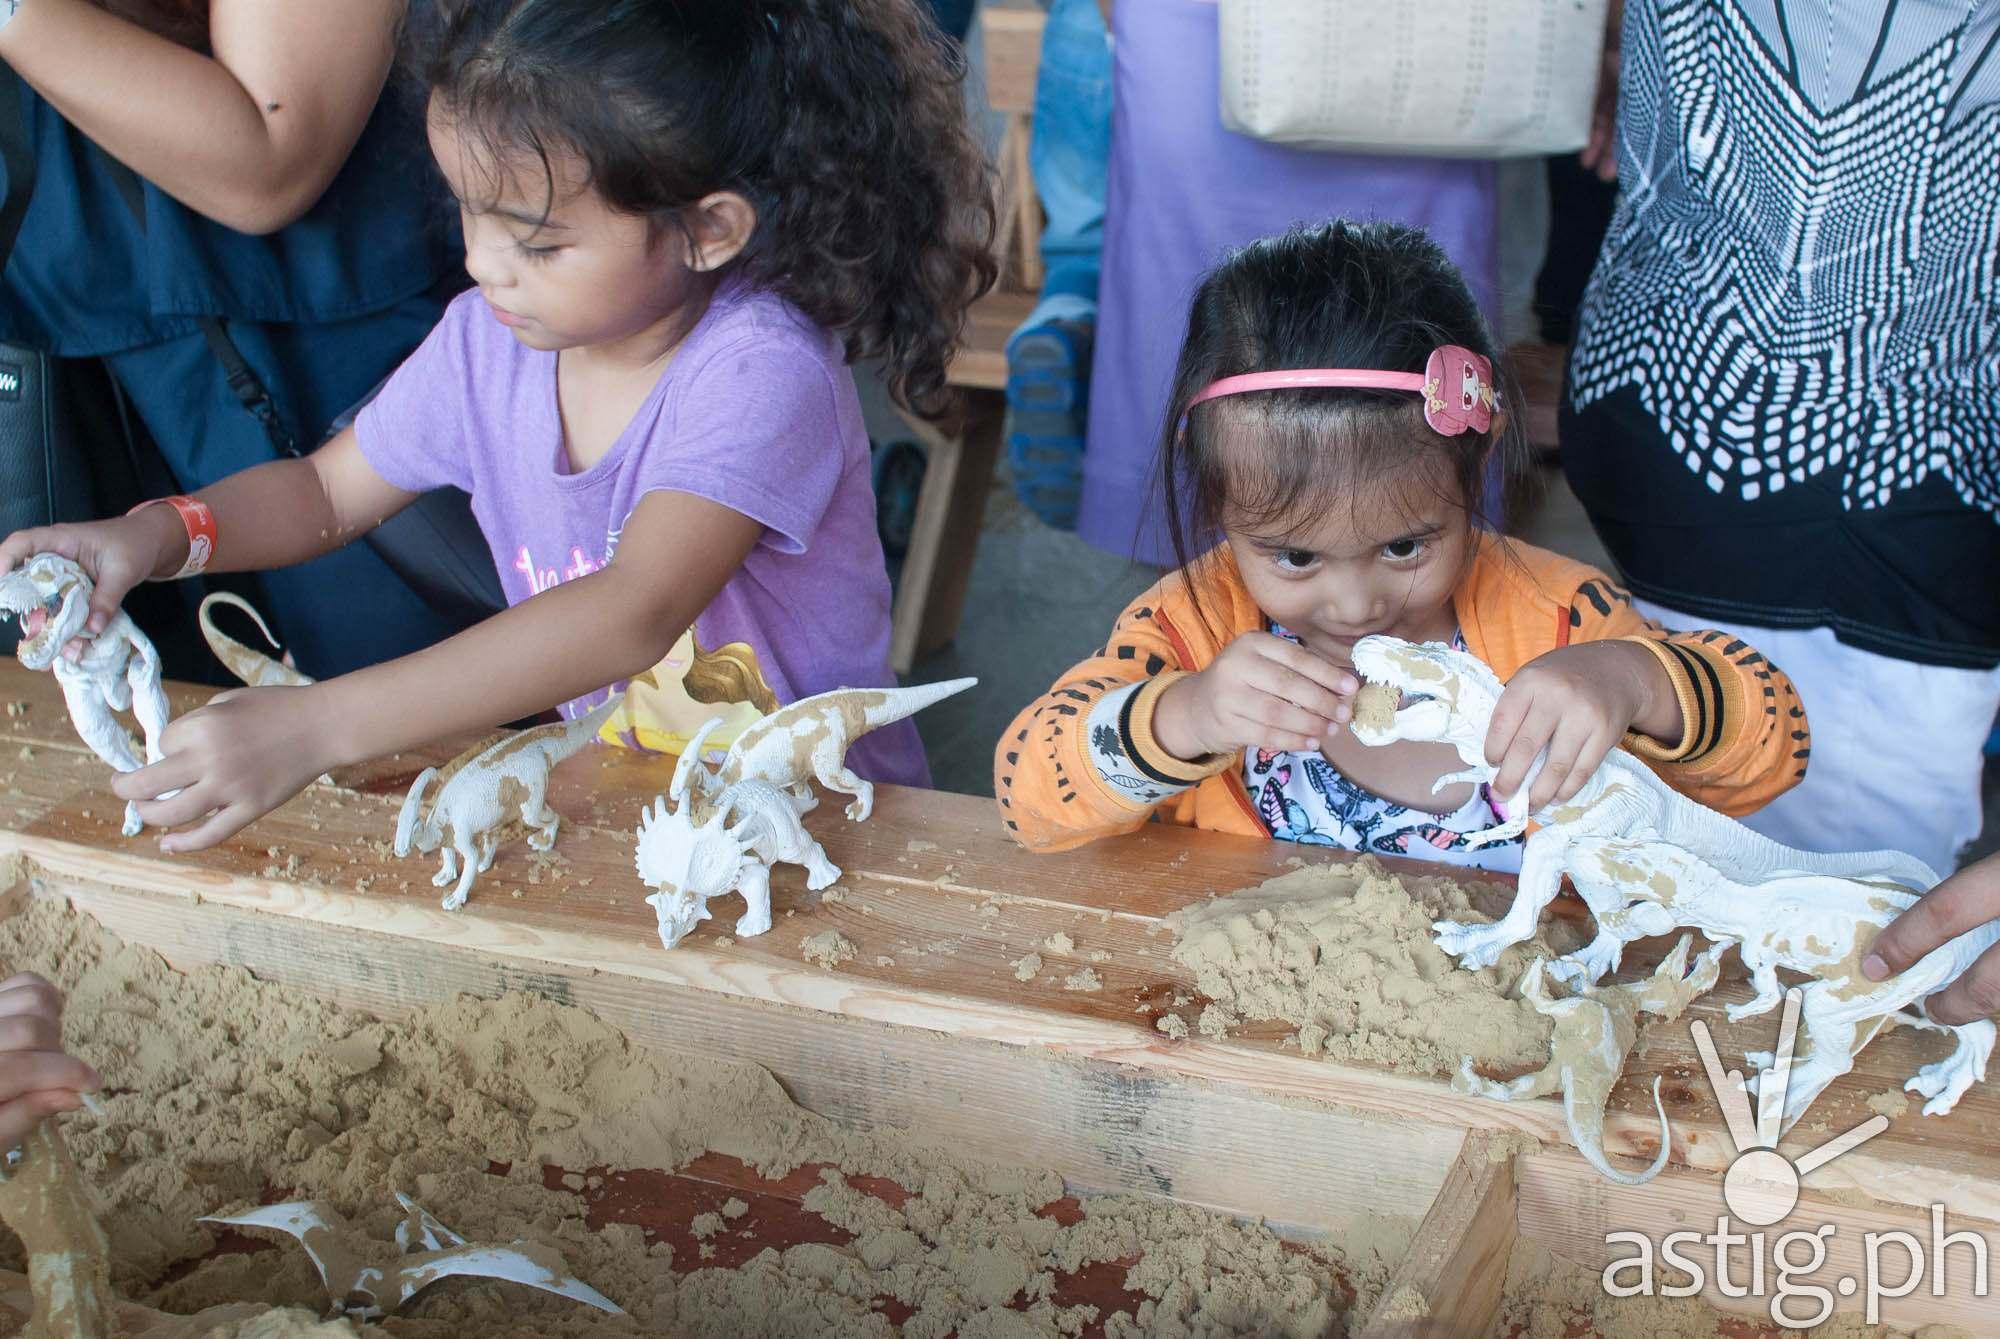 Dinosaur sandbox - Dinosaurs Around The World exhibit - Mind Museum BGC